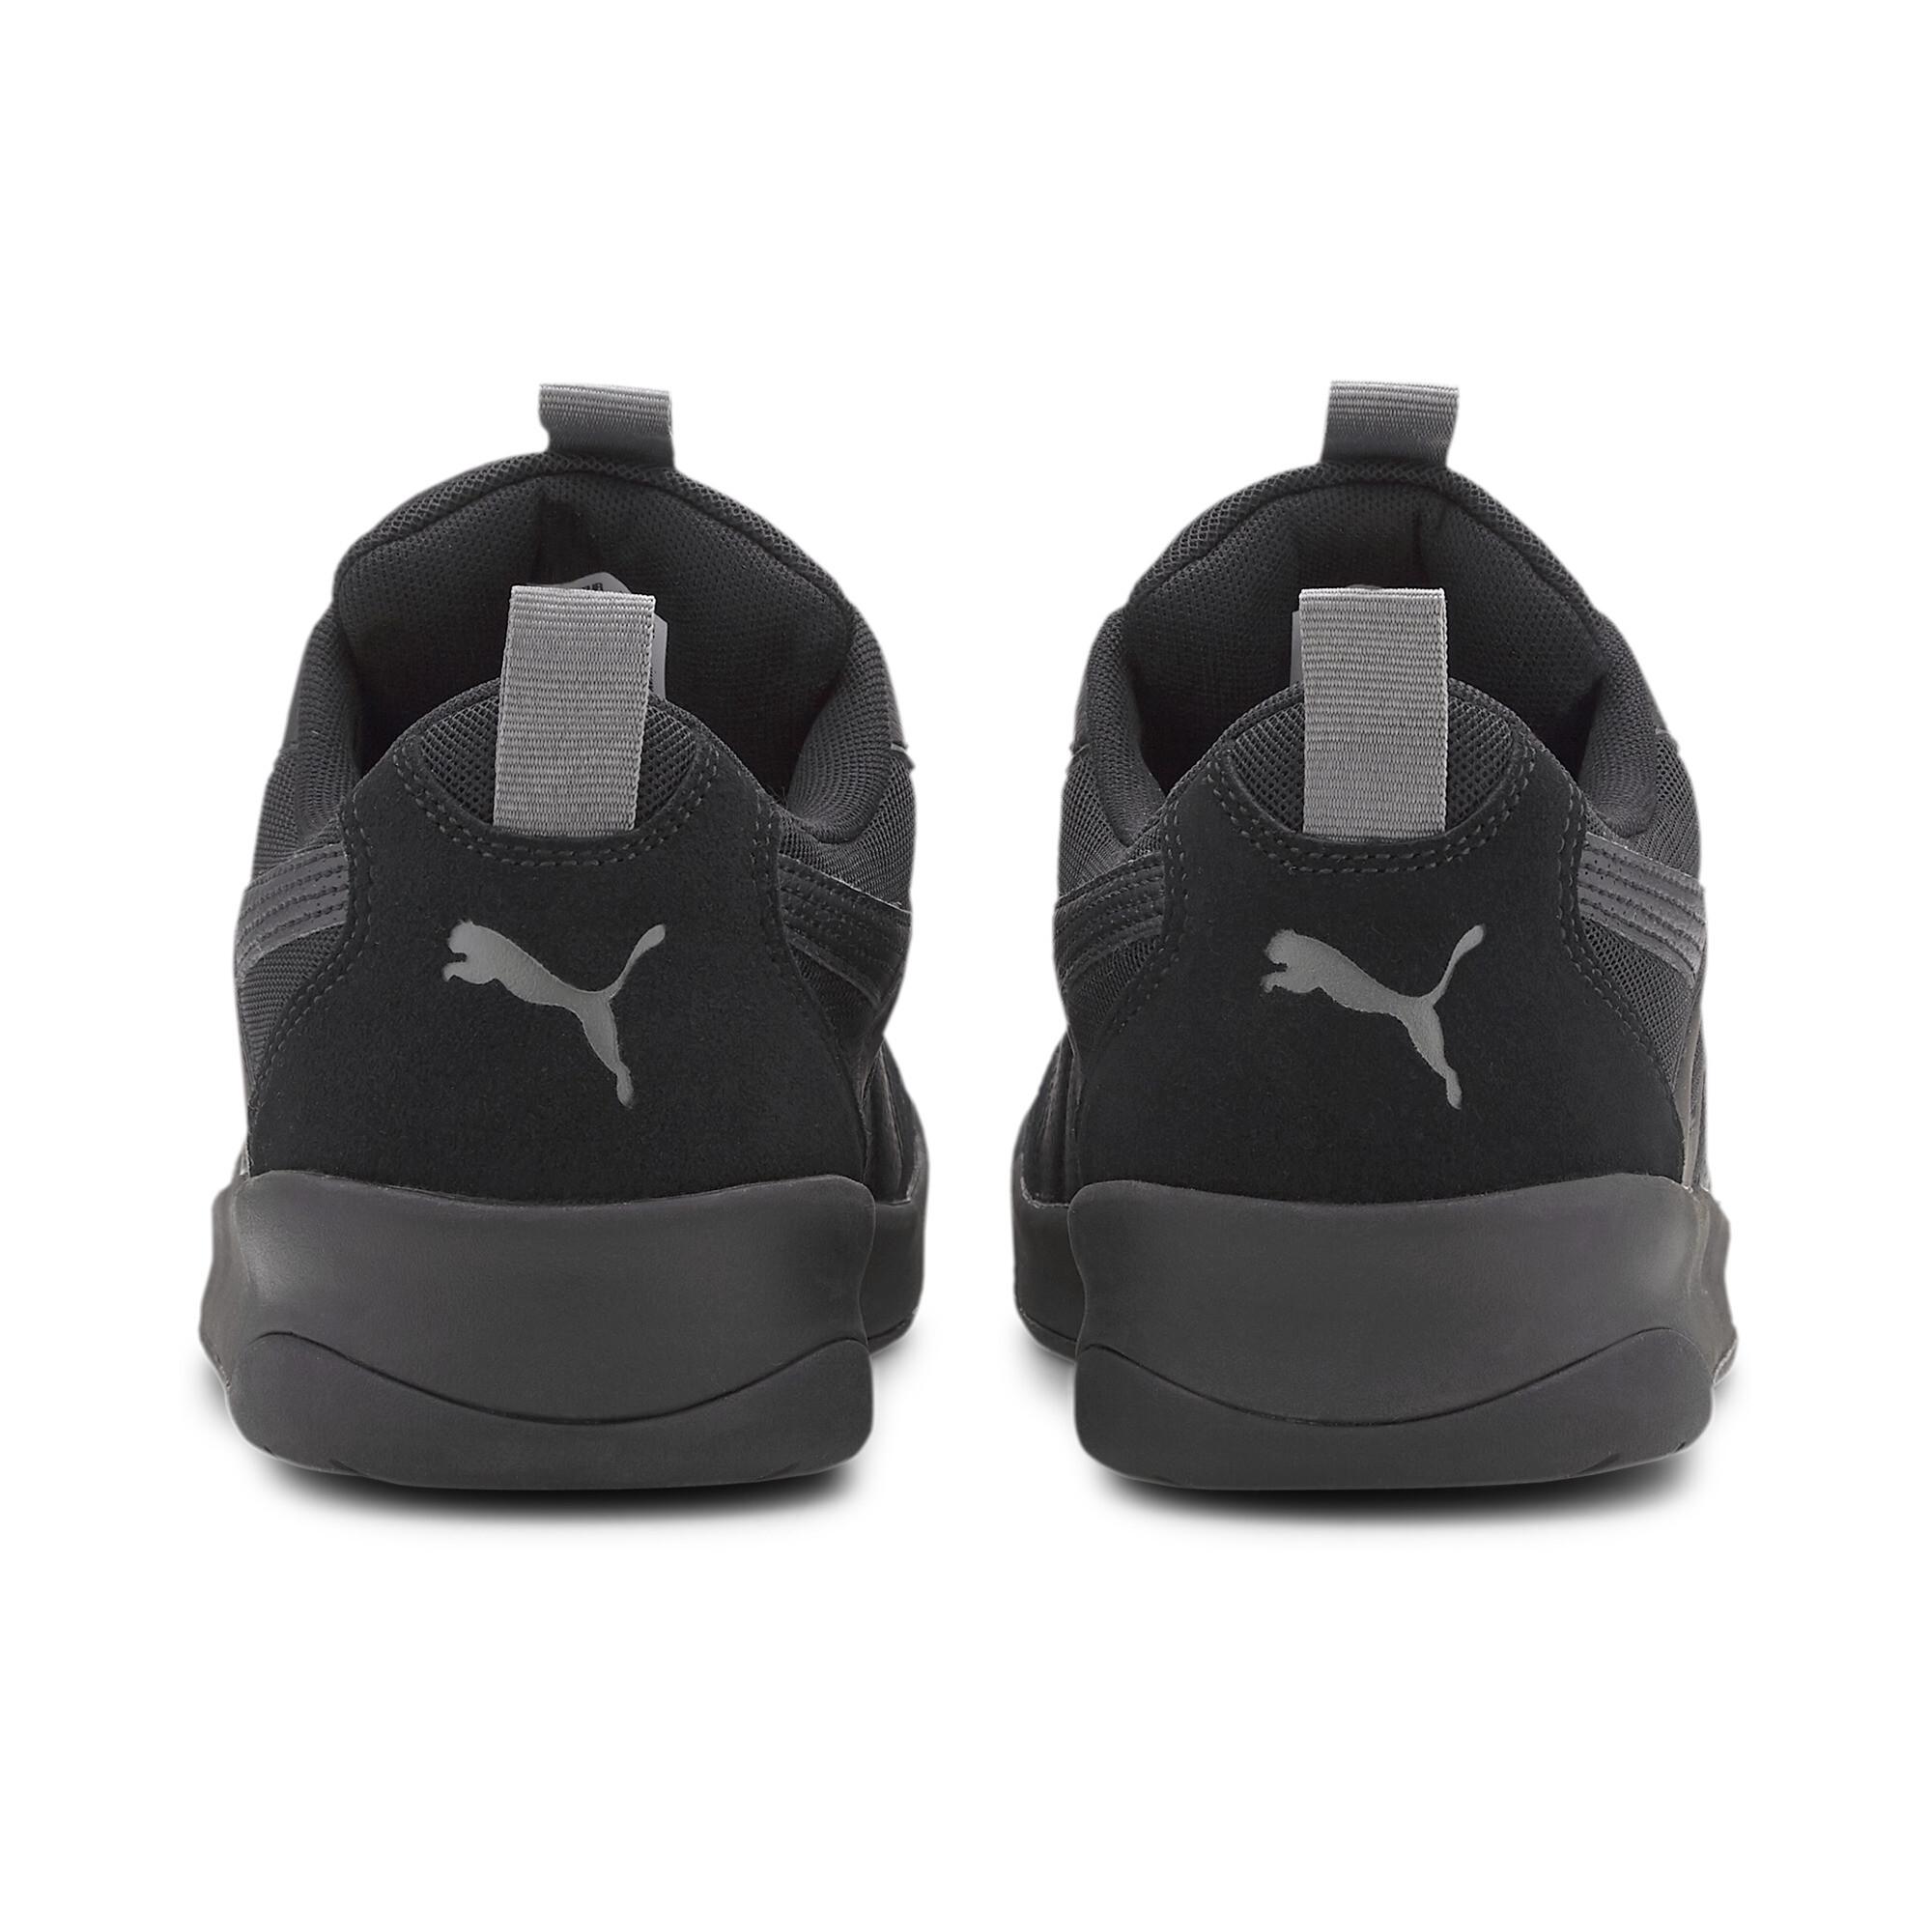 miniature 6 - Puma Men's Backcourt Sneakers